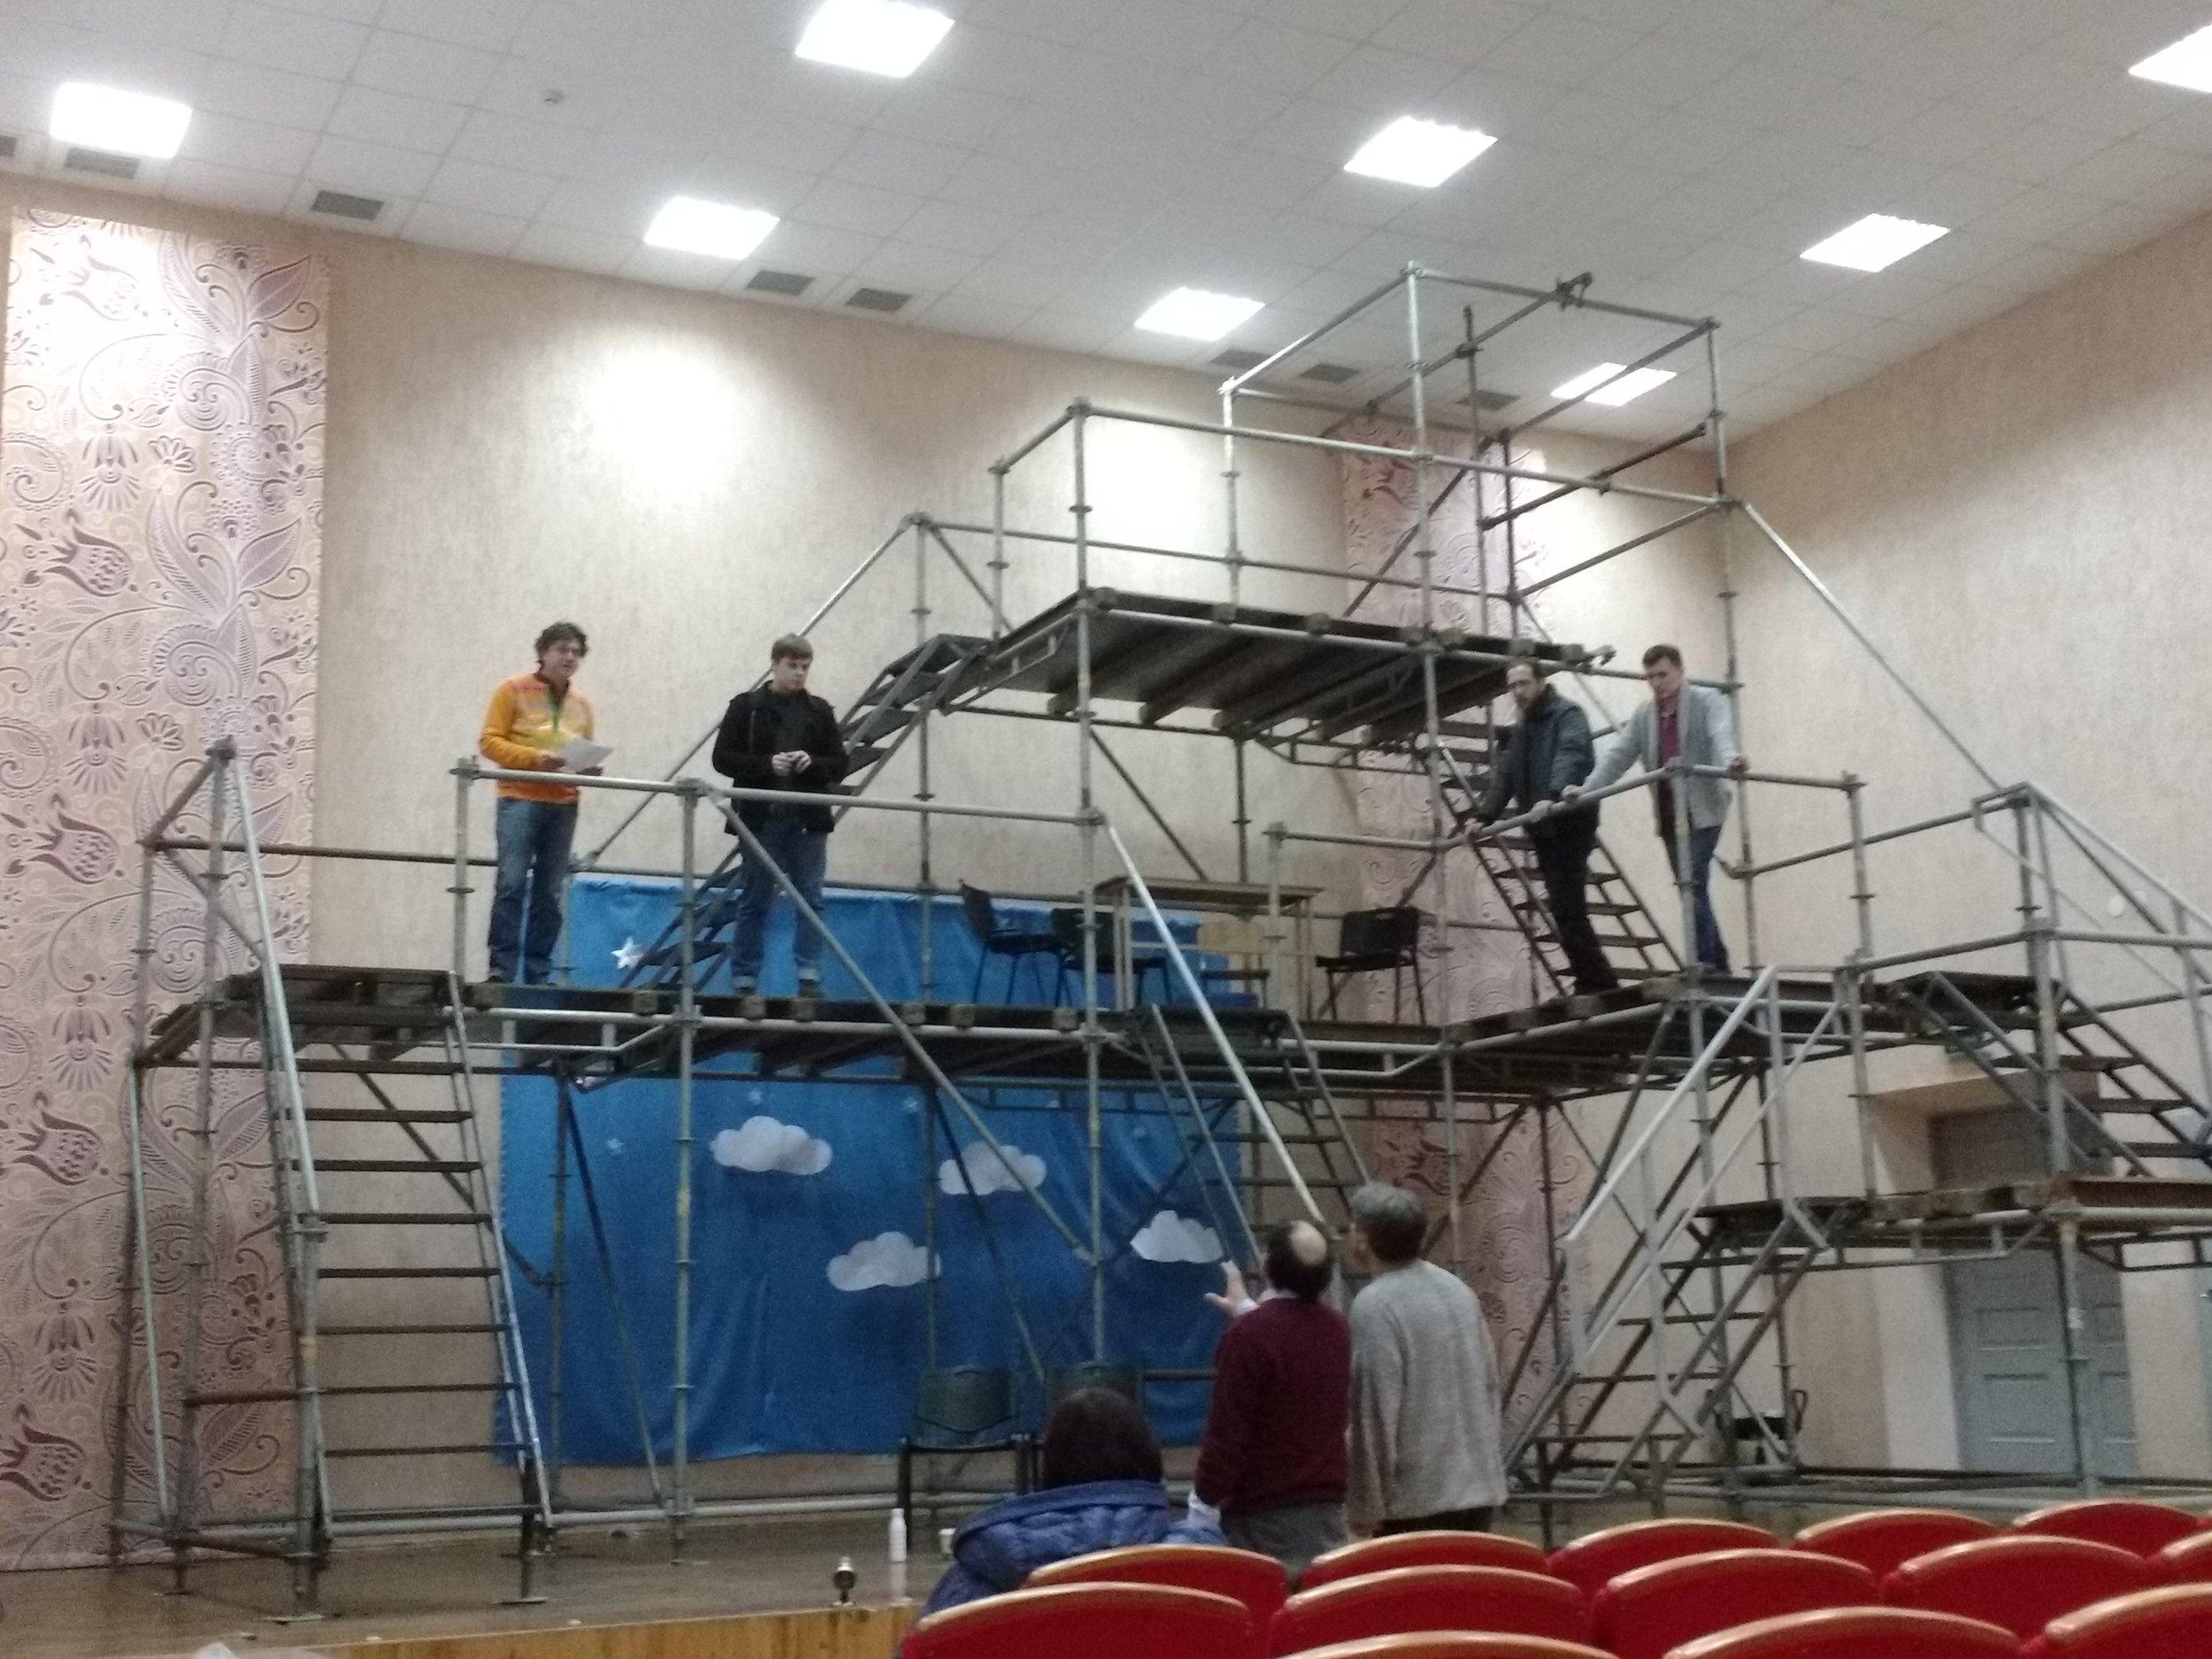 Troilus and cressida rehearsals ukraine.jpg